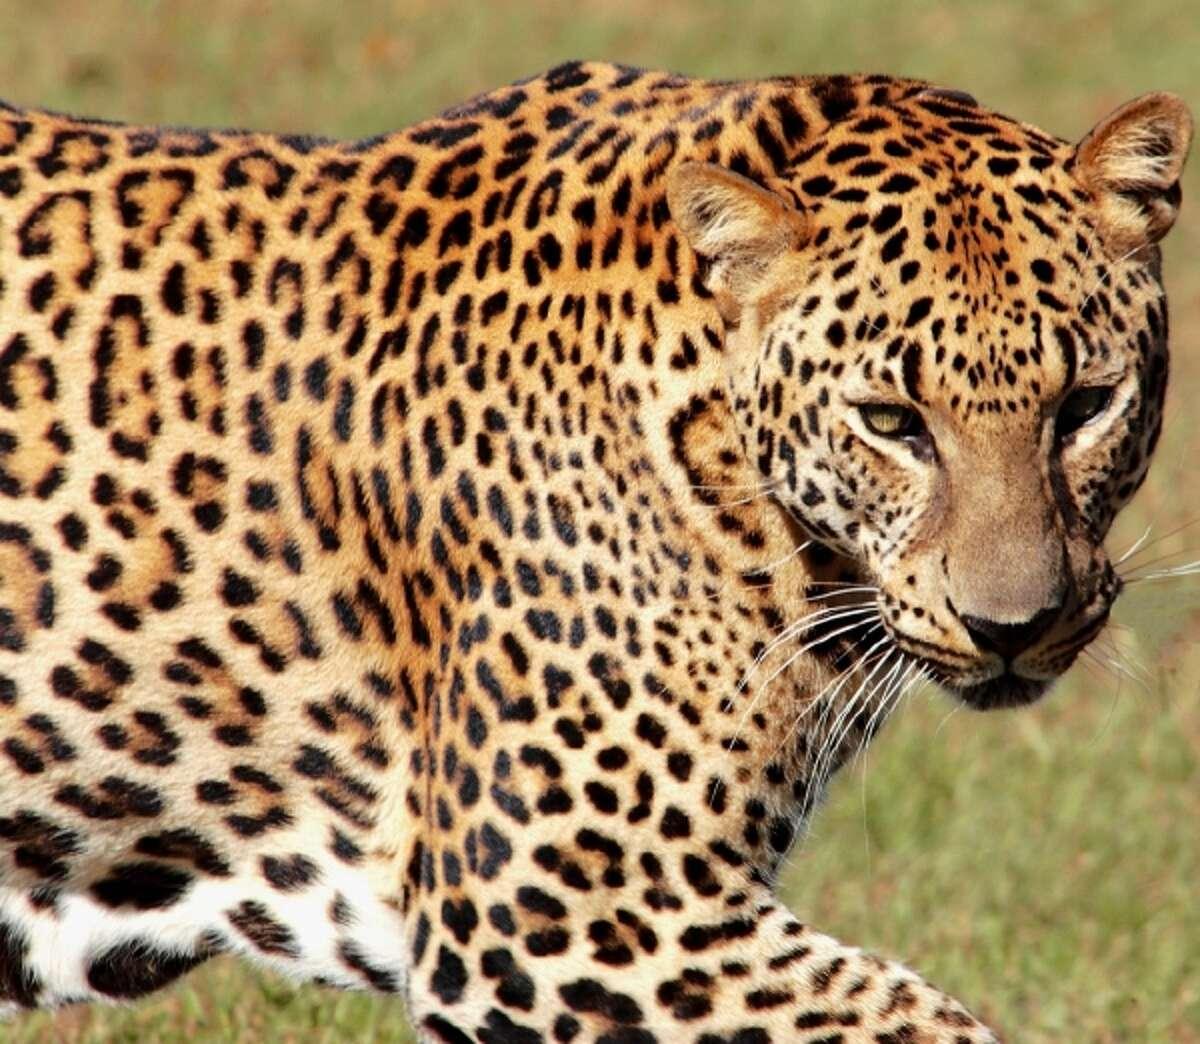 A leopard.